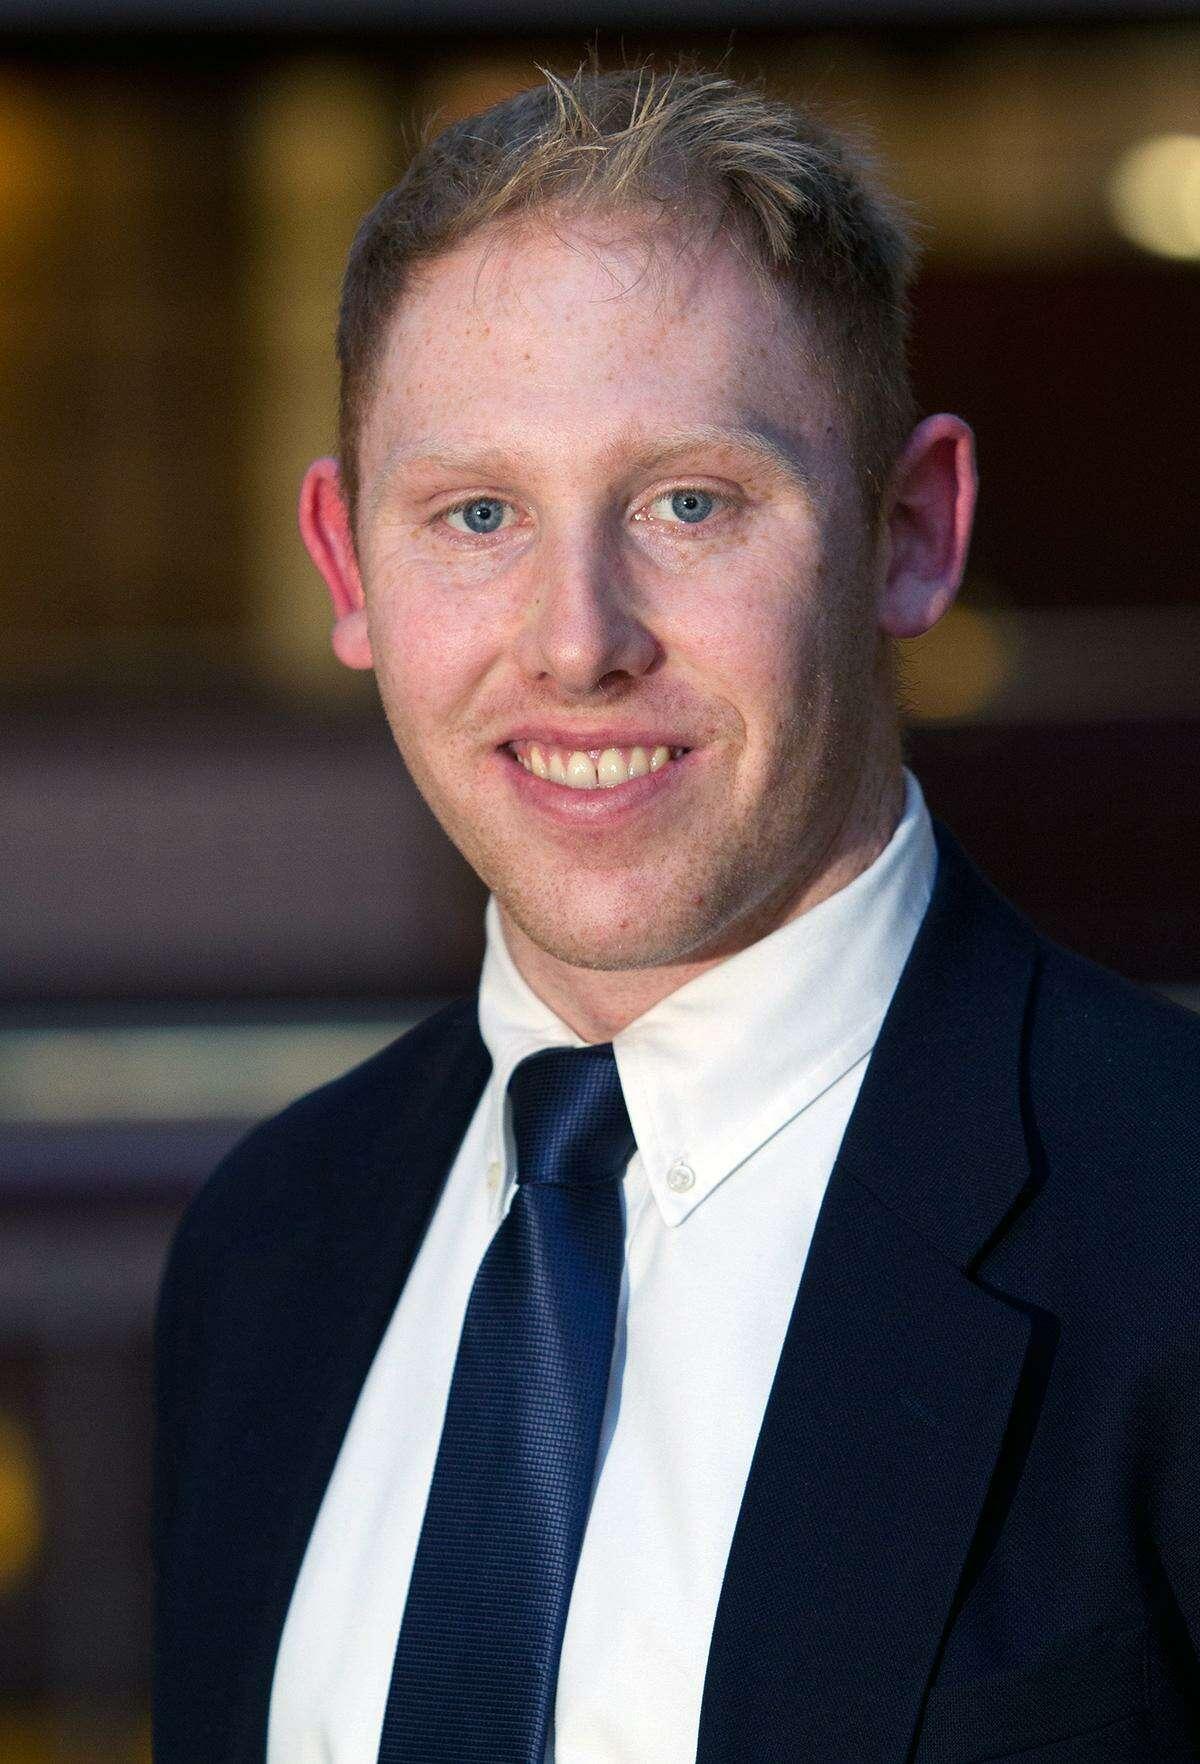 Representative Stephen Harding represents Brookfield, Bethel and Danbury, Conn. - district 107